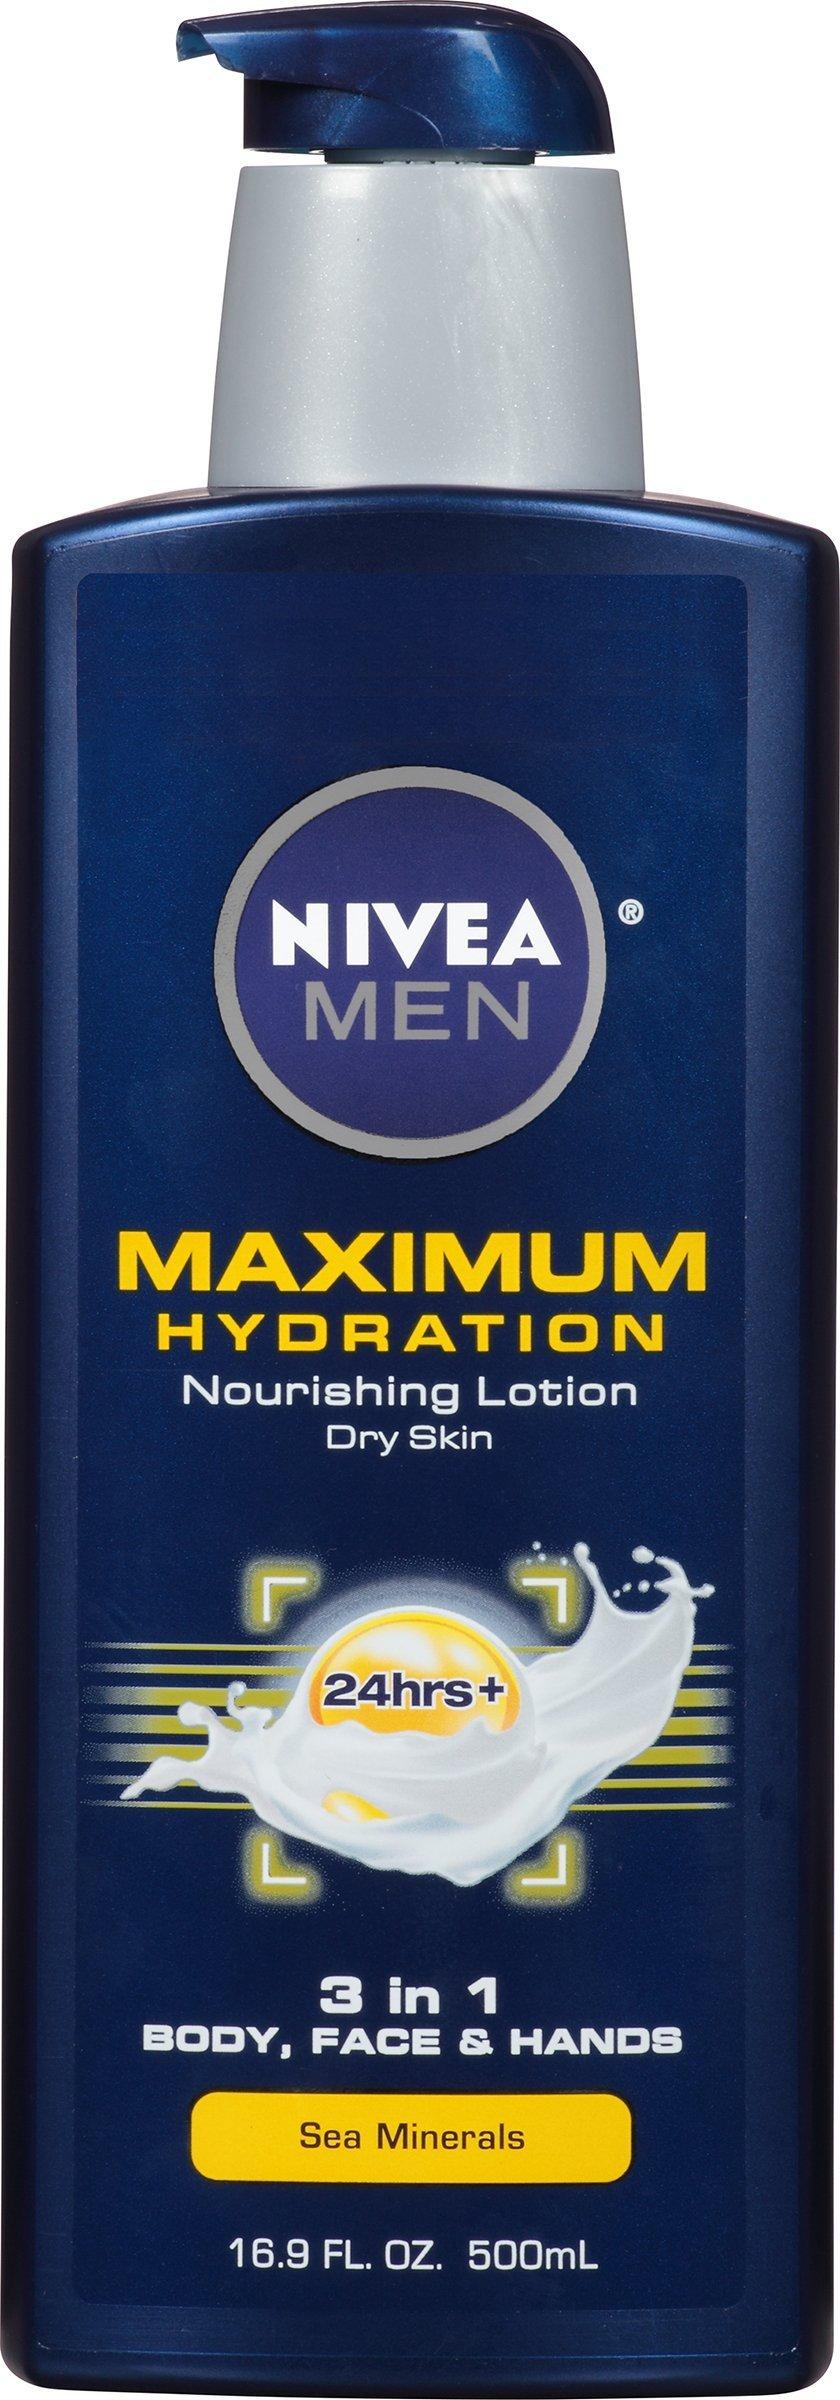 NIVEA Men Maximum Hydration 3 in 1 Nourishing Lotion 16.9 Fluid Ounce